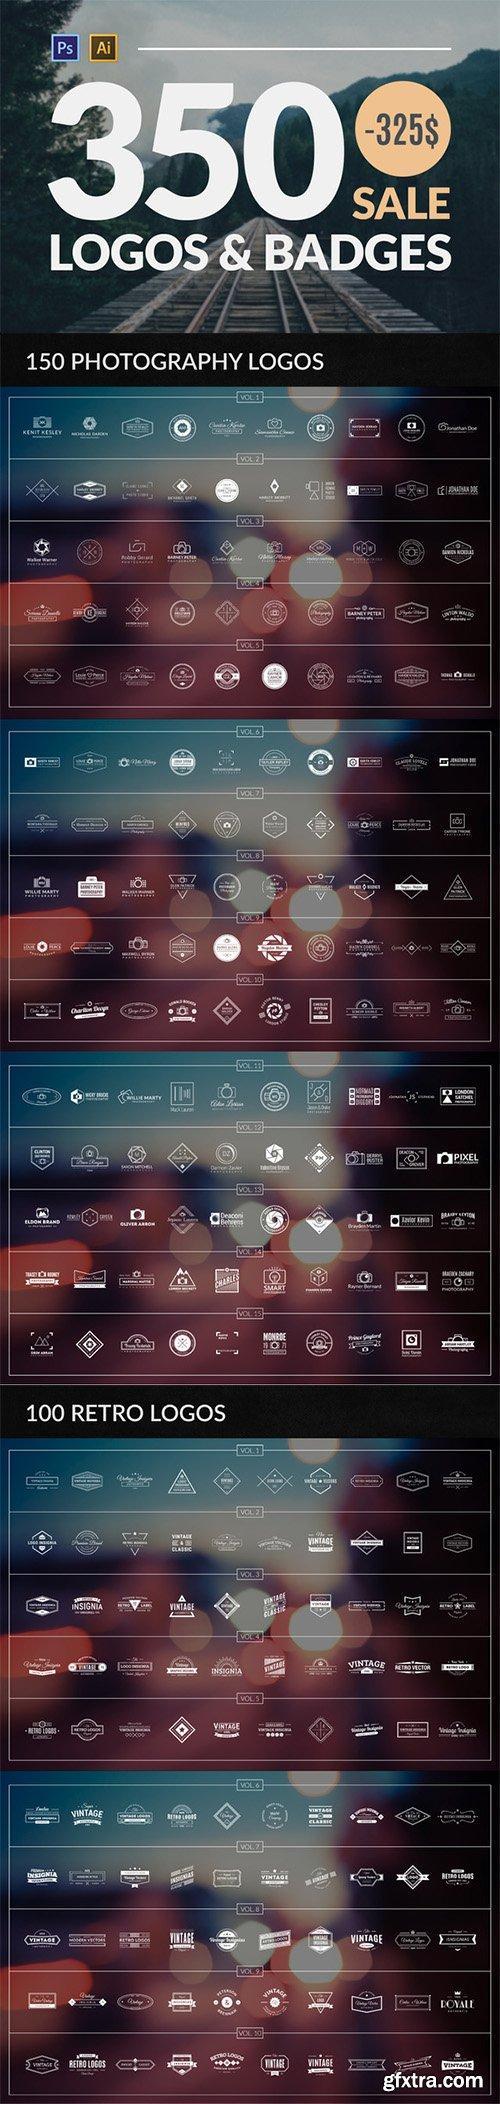 CM 350 Logos & Badges 233294